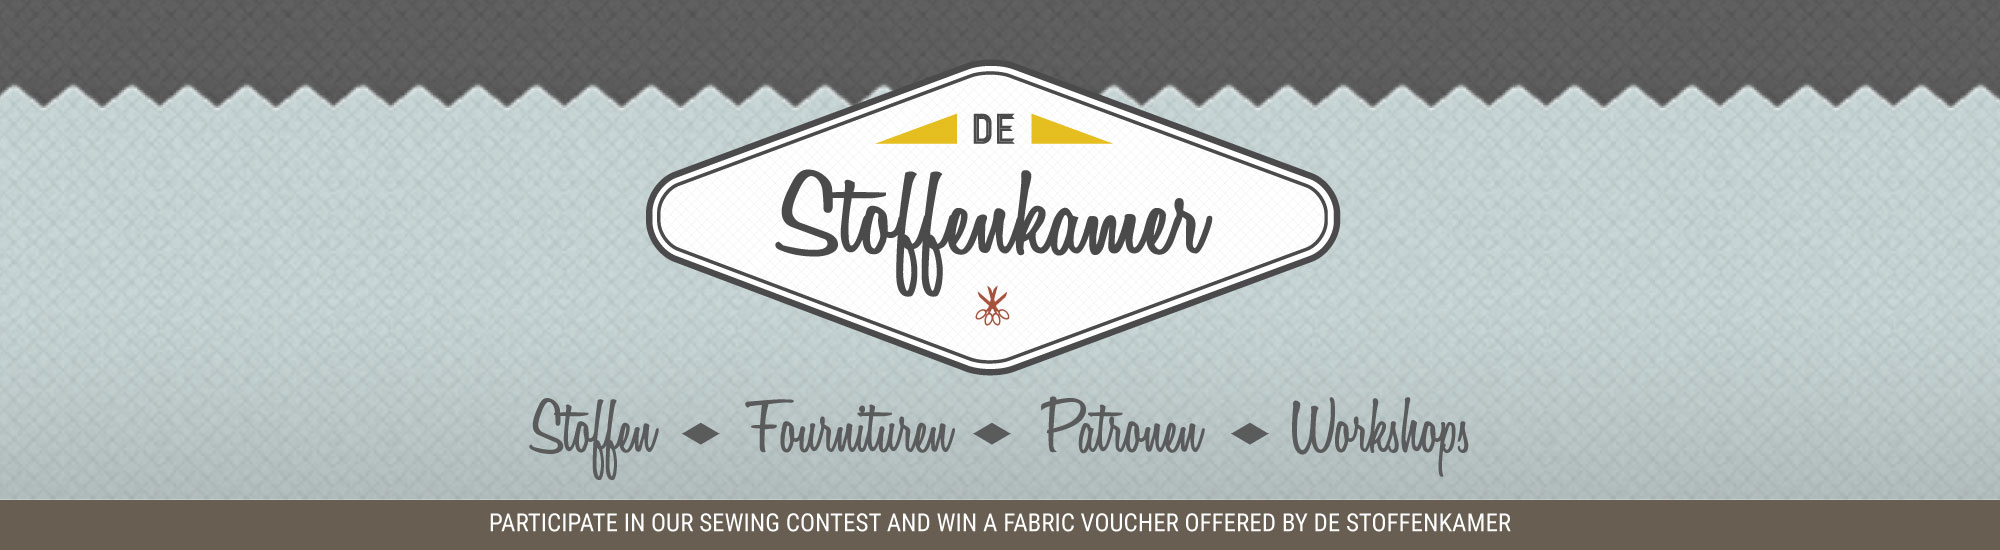 banners-sponsors_destoffenkamer